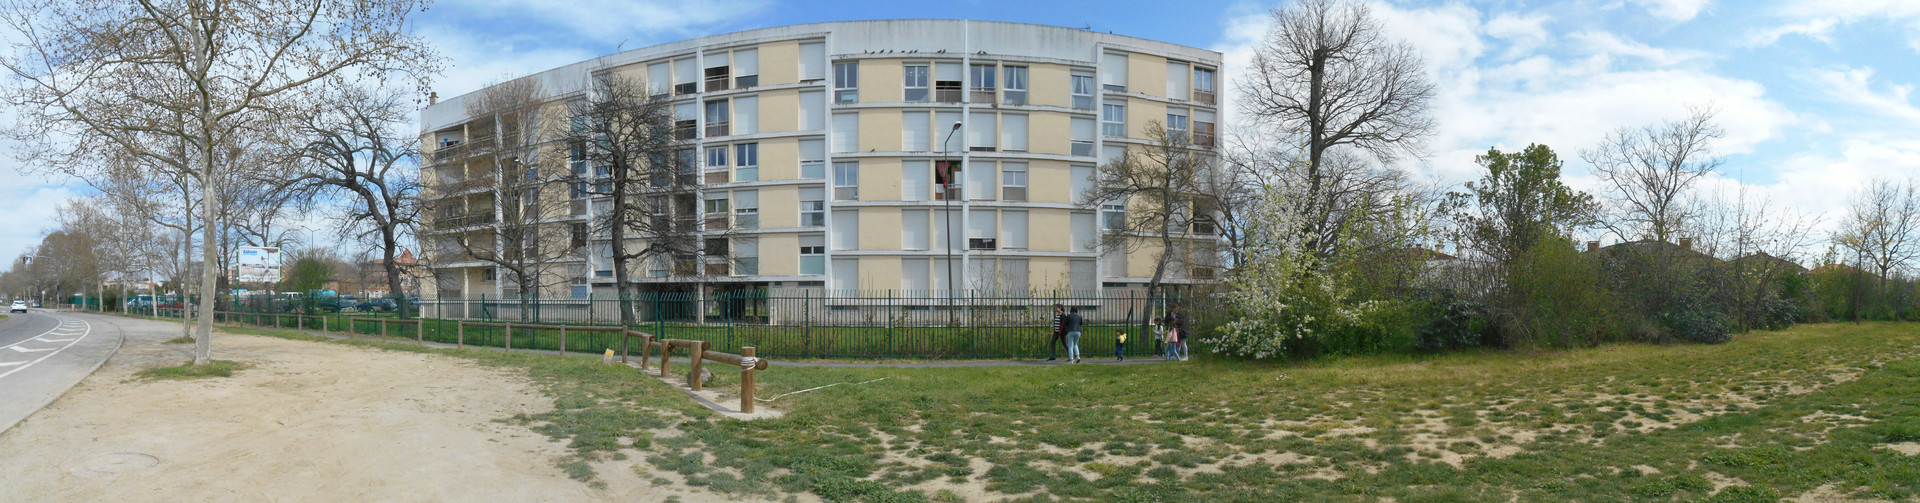 panorama milan 08 residence du parc vue nord avenue reynerie